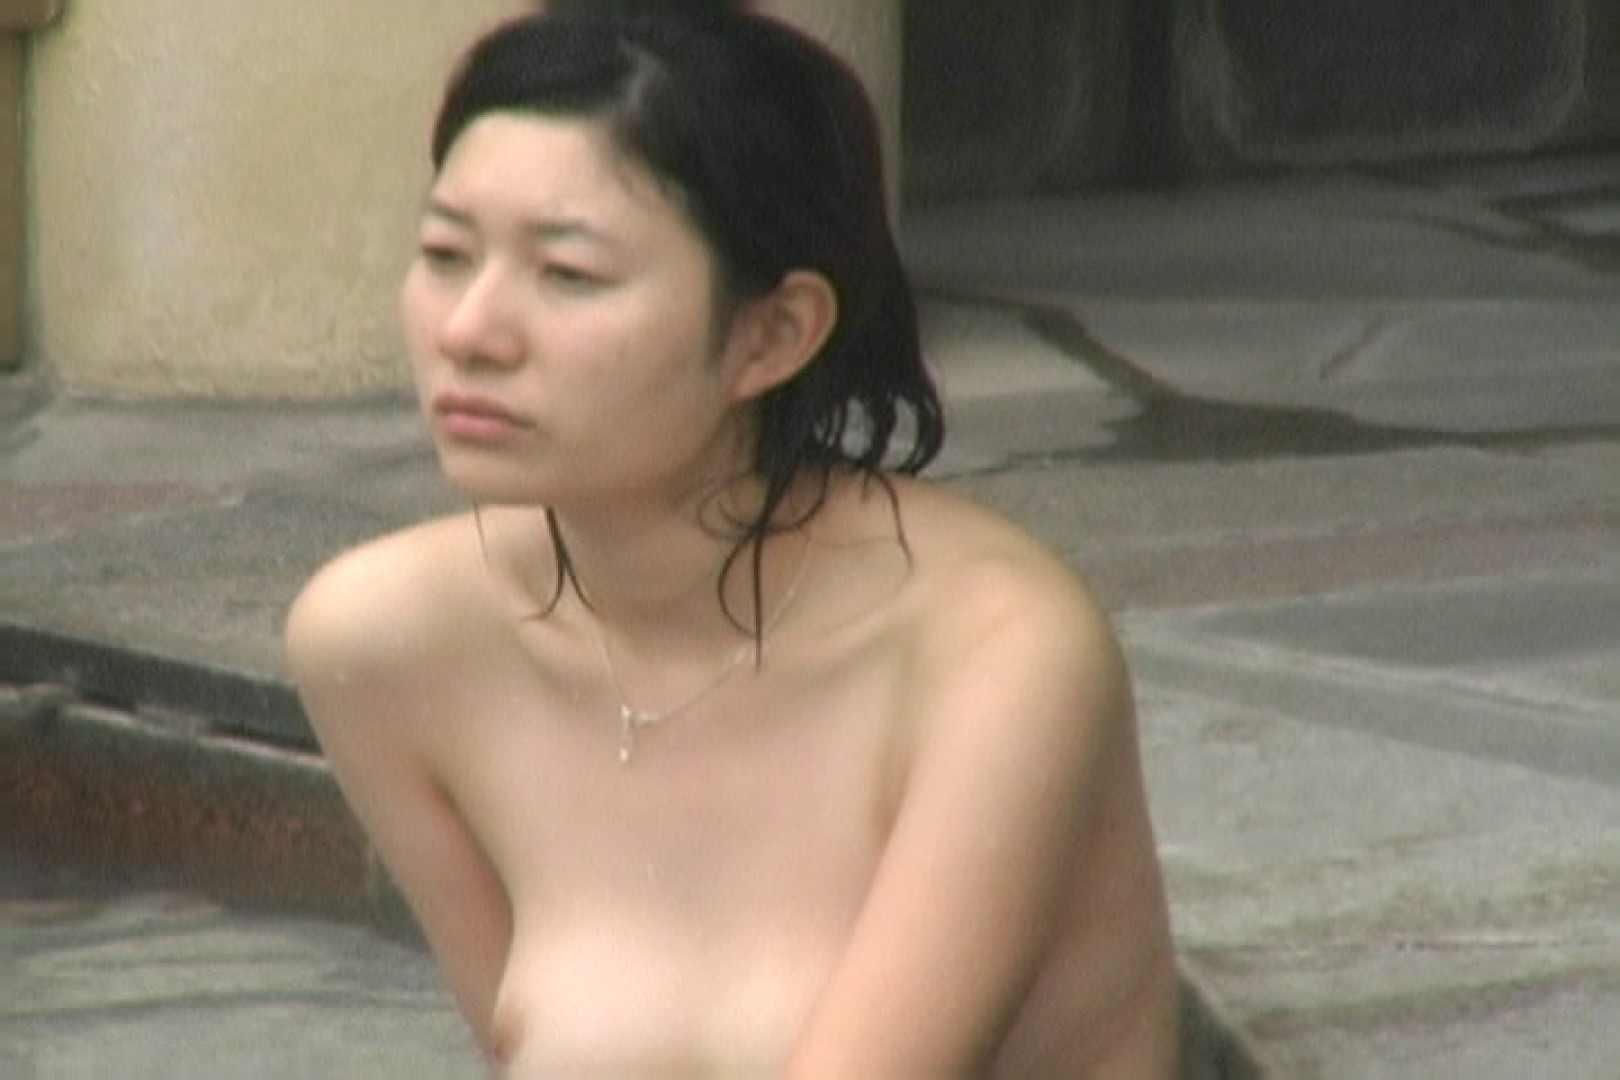 Aquaな露天風呂Vol.549 露天風呂突入 | 盗撮師作品  93pic 4